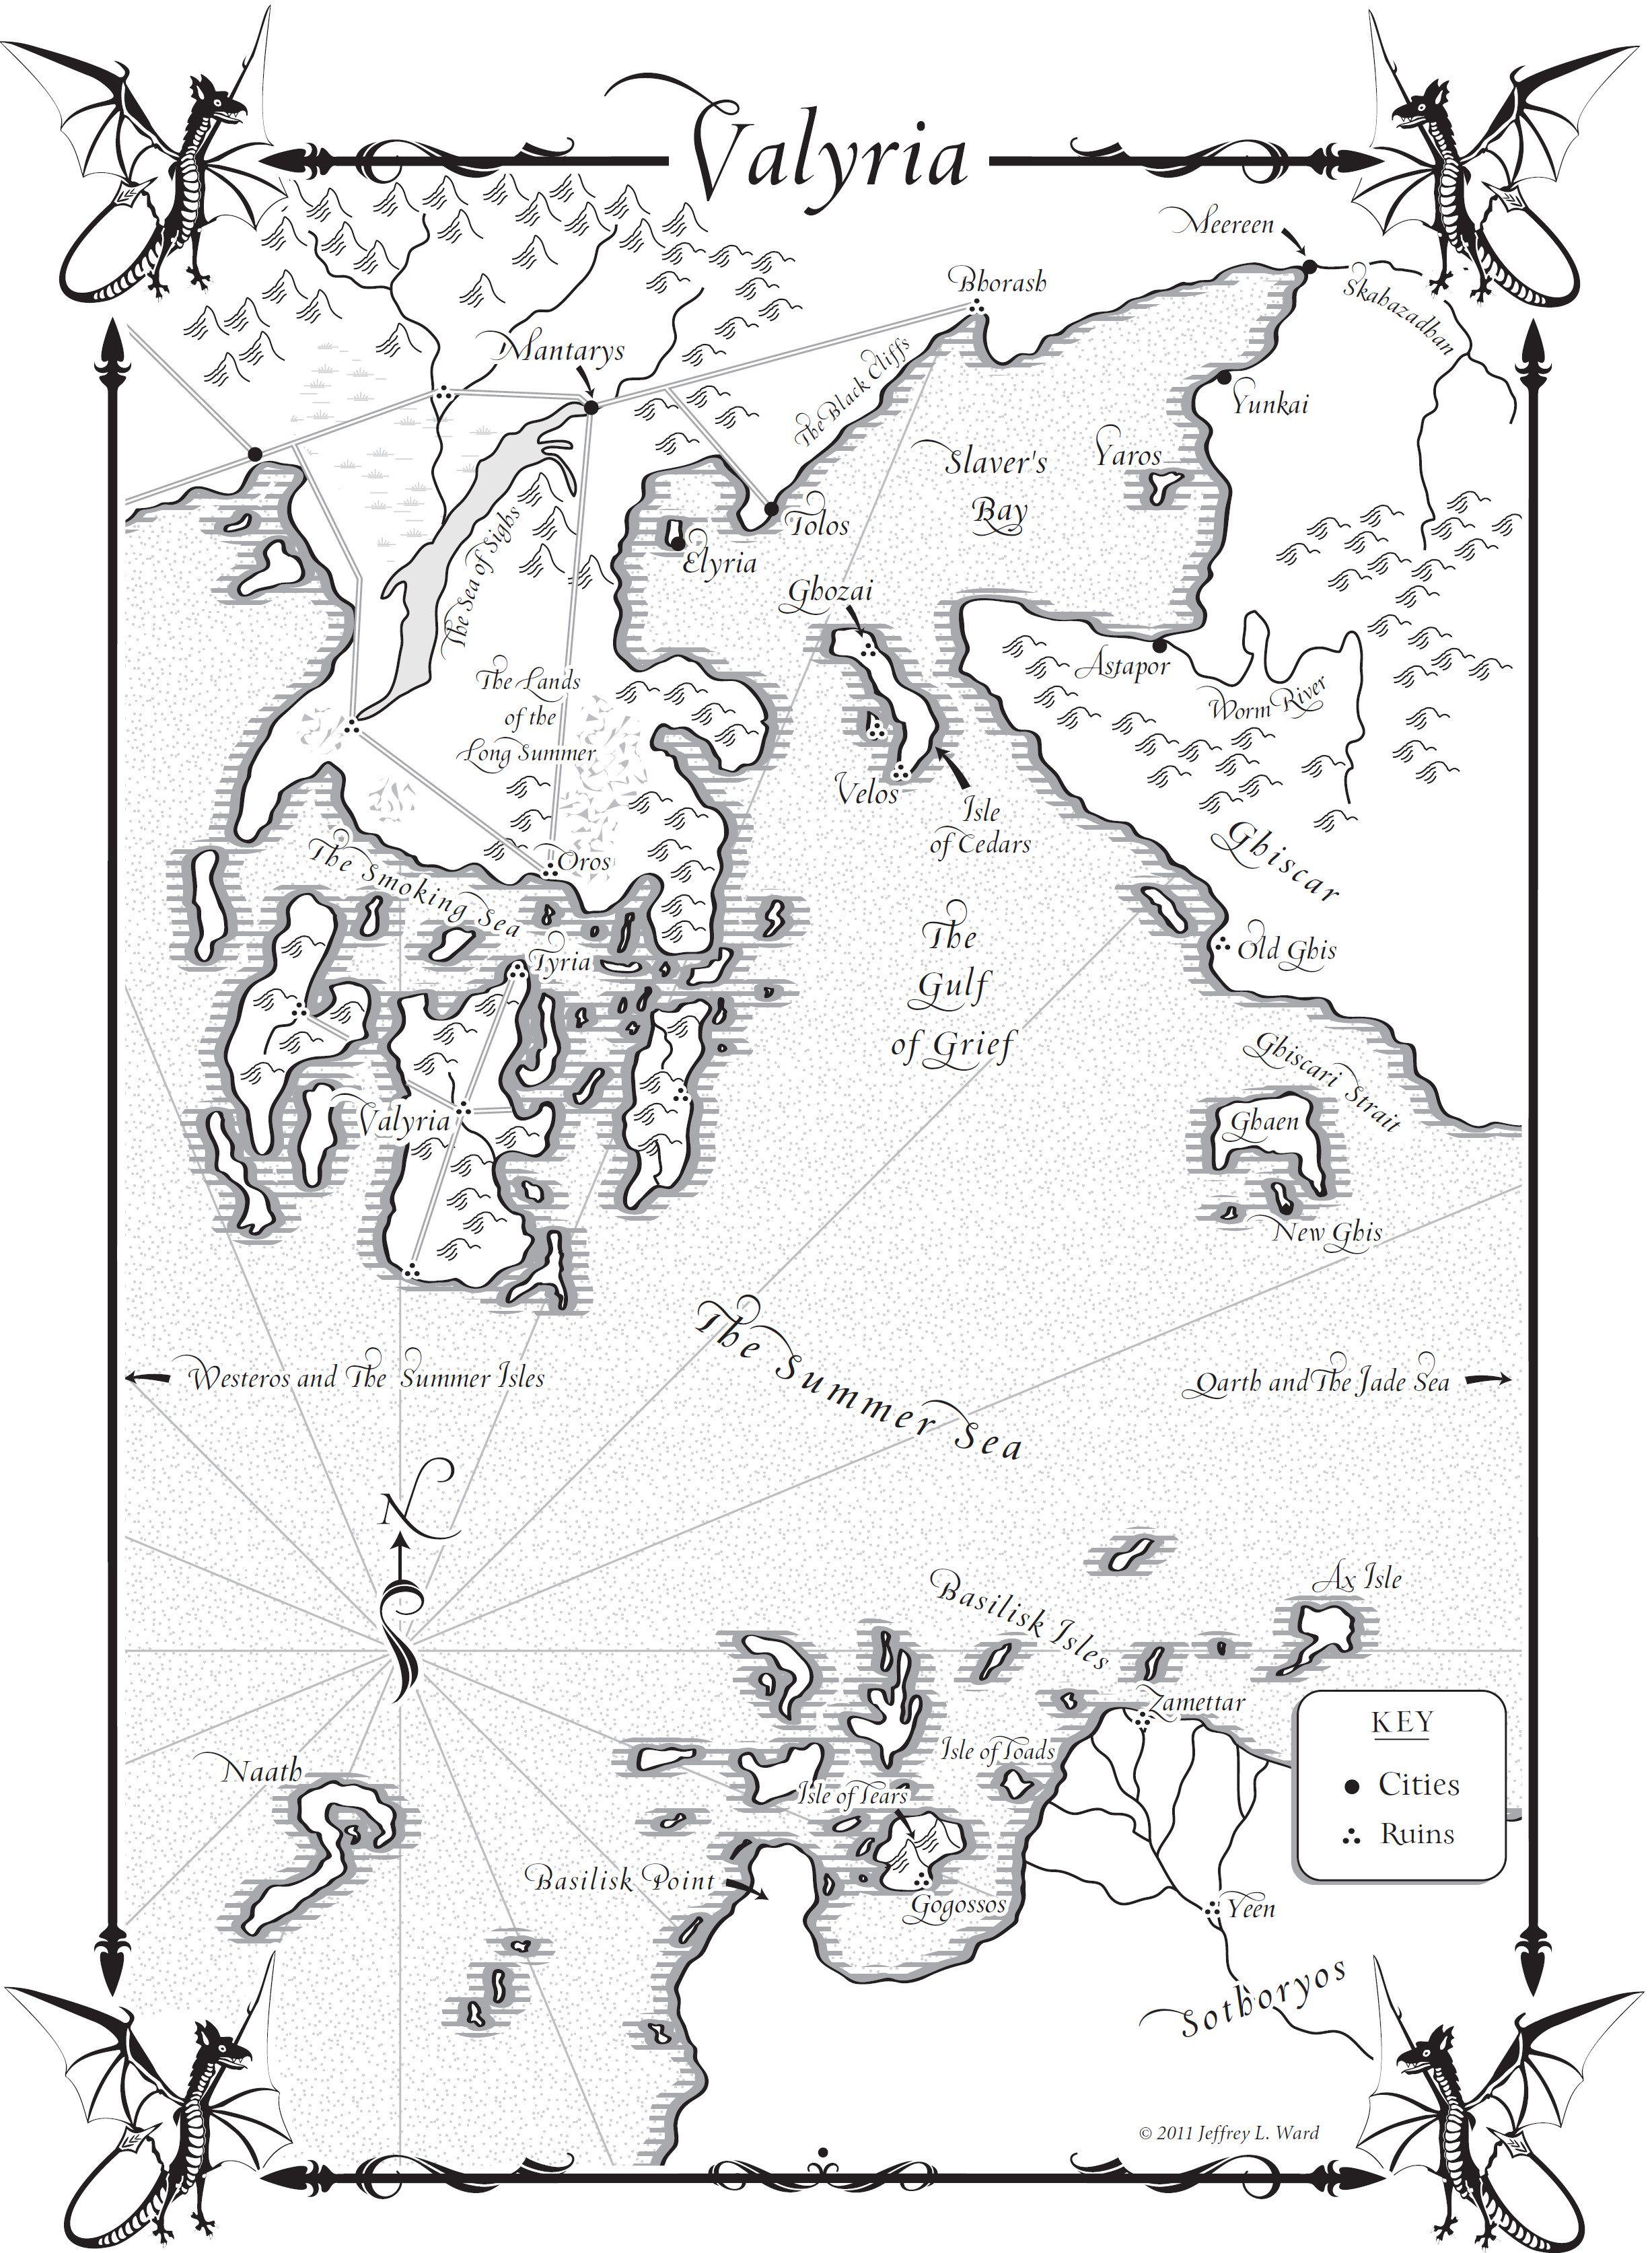 Meereen Skabazabdan Yunkai Astapor Basalisk Isles Valyria Old